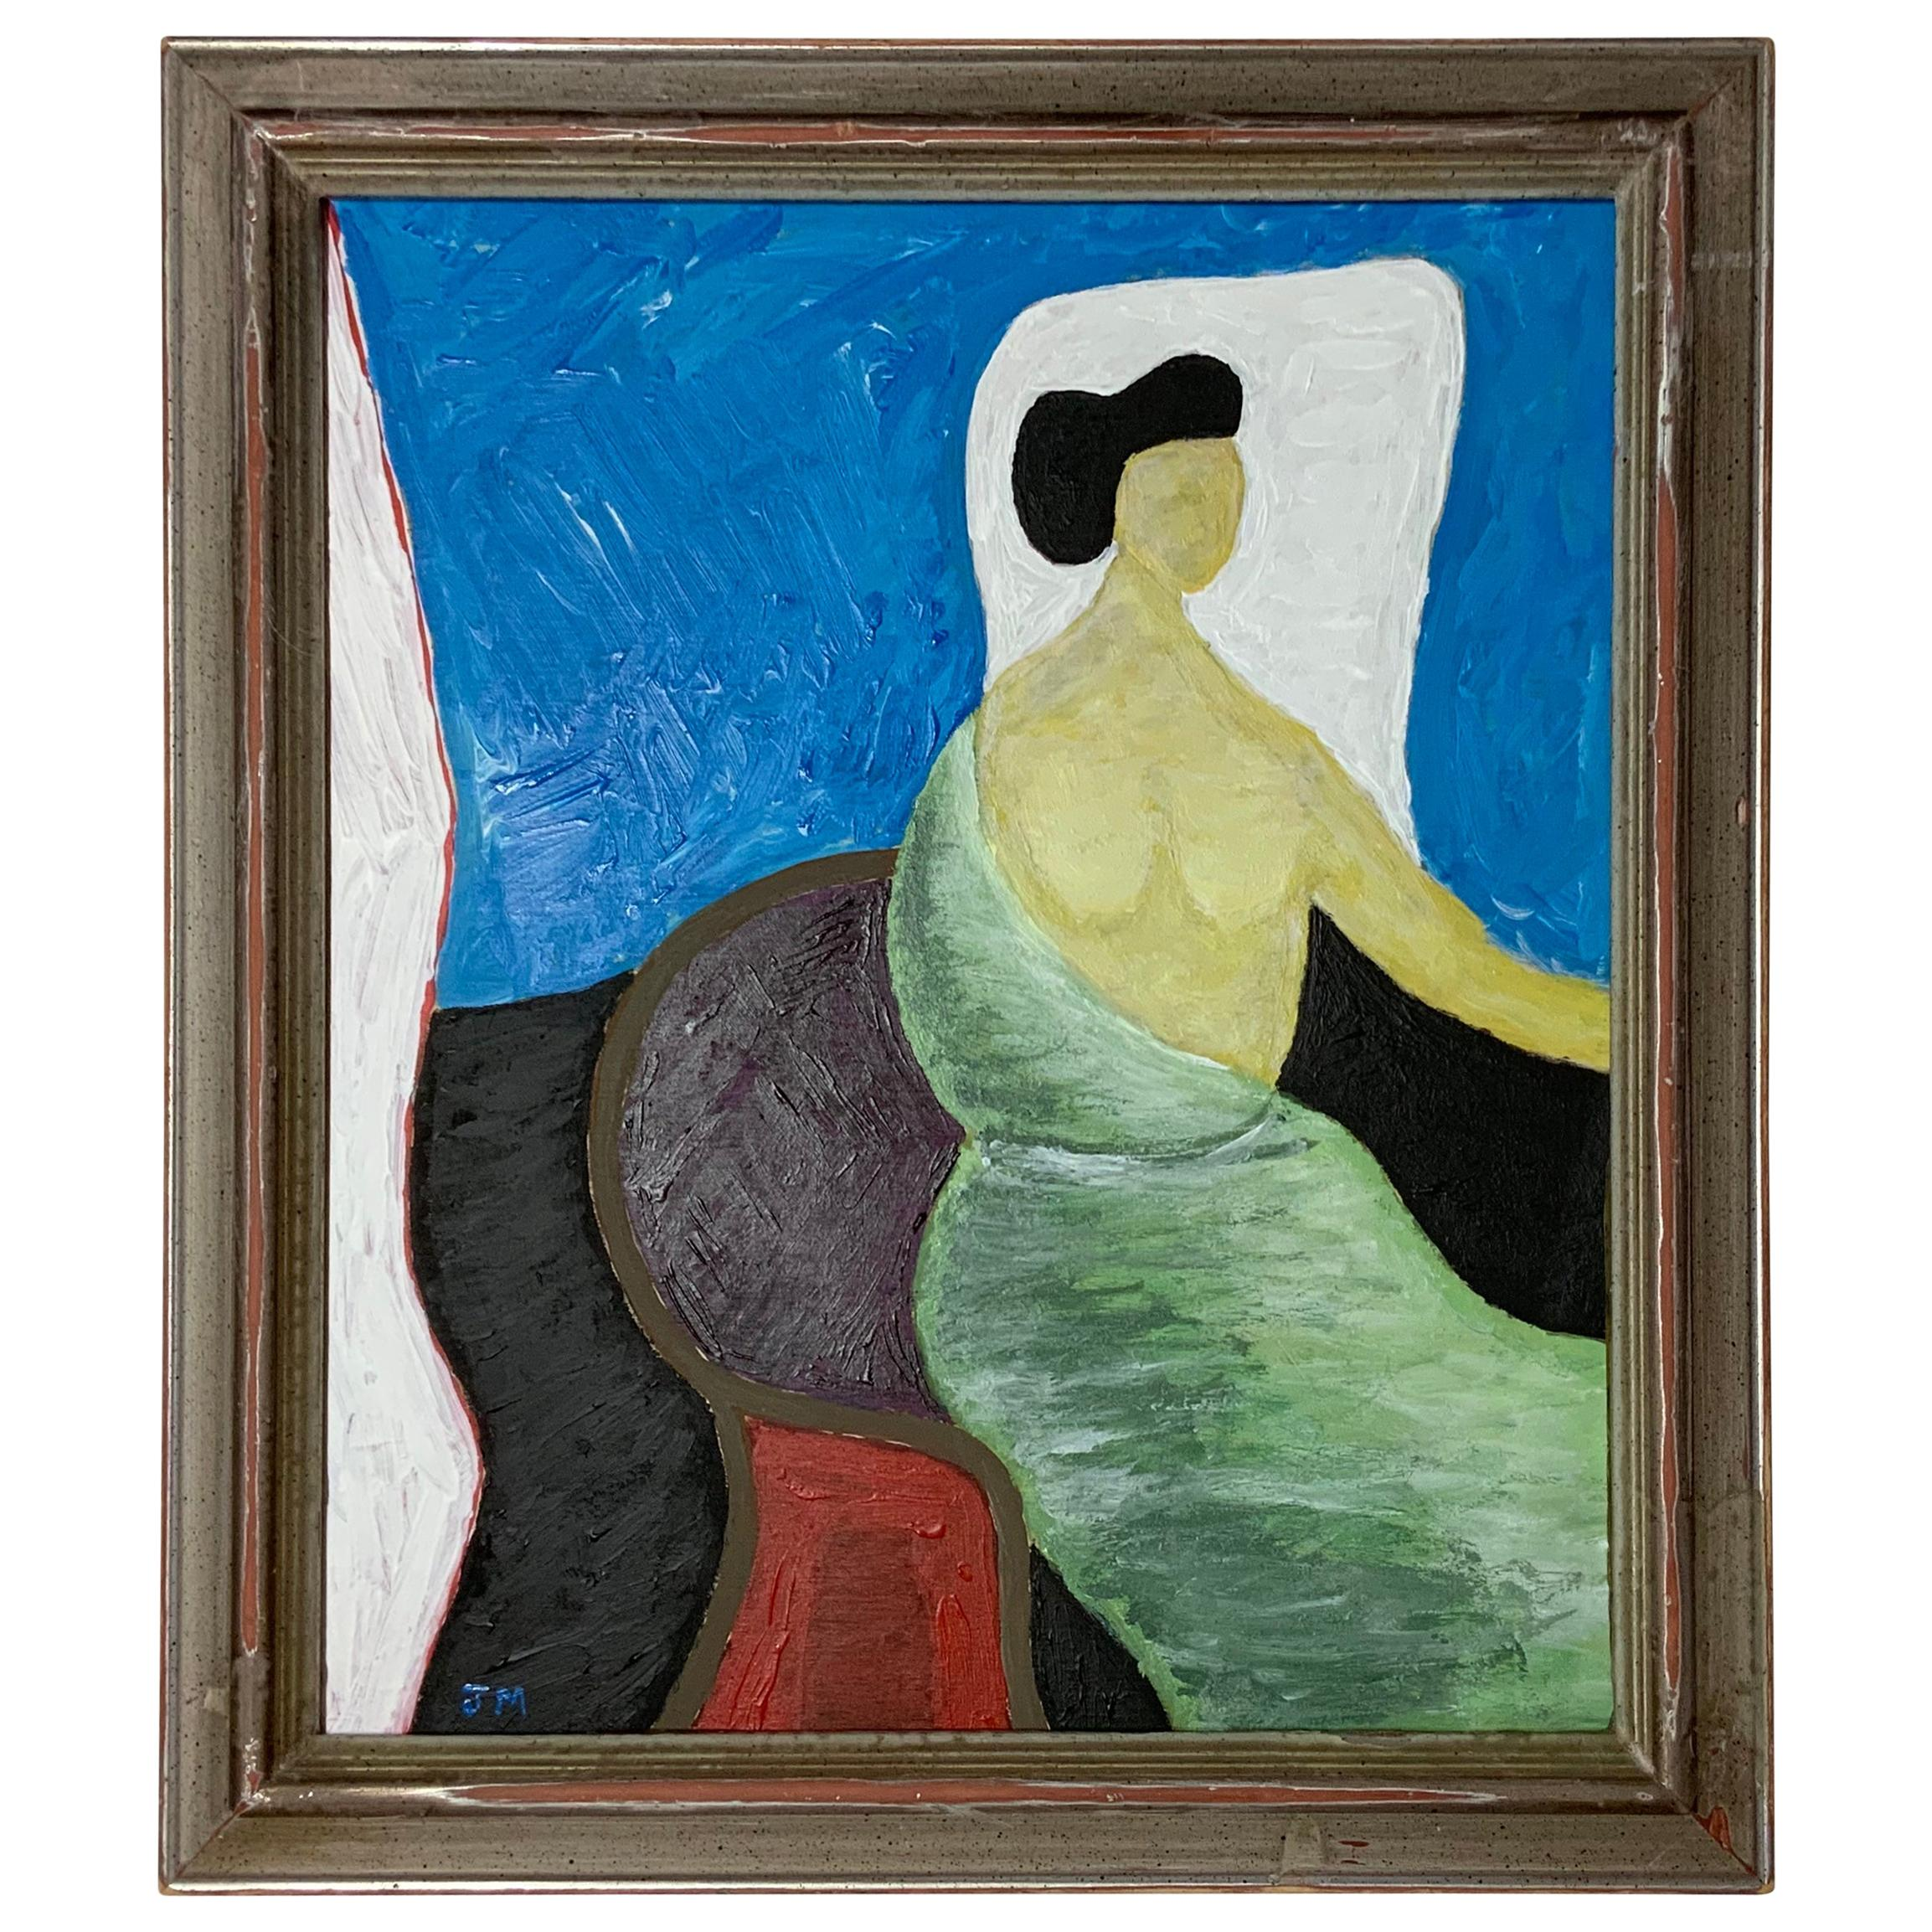 'Overlooking Sitting Woman, by Joseph Malekan